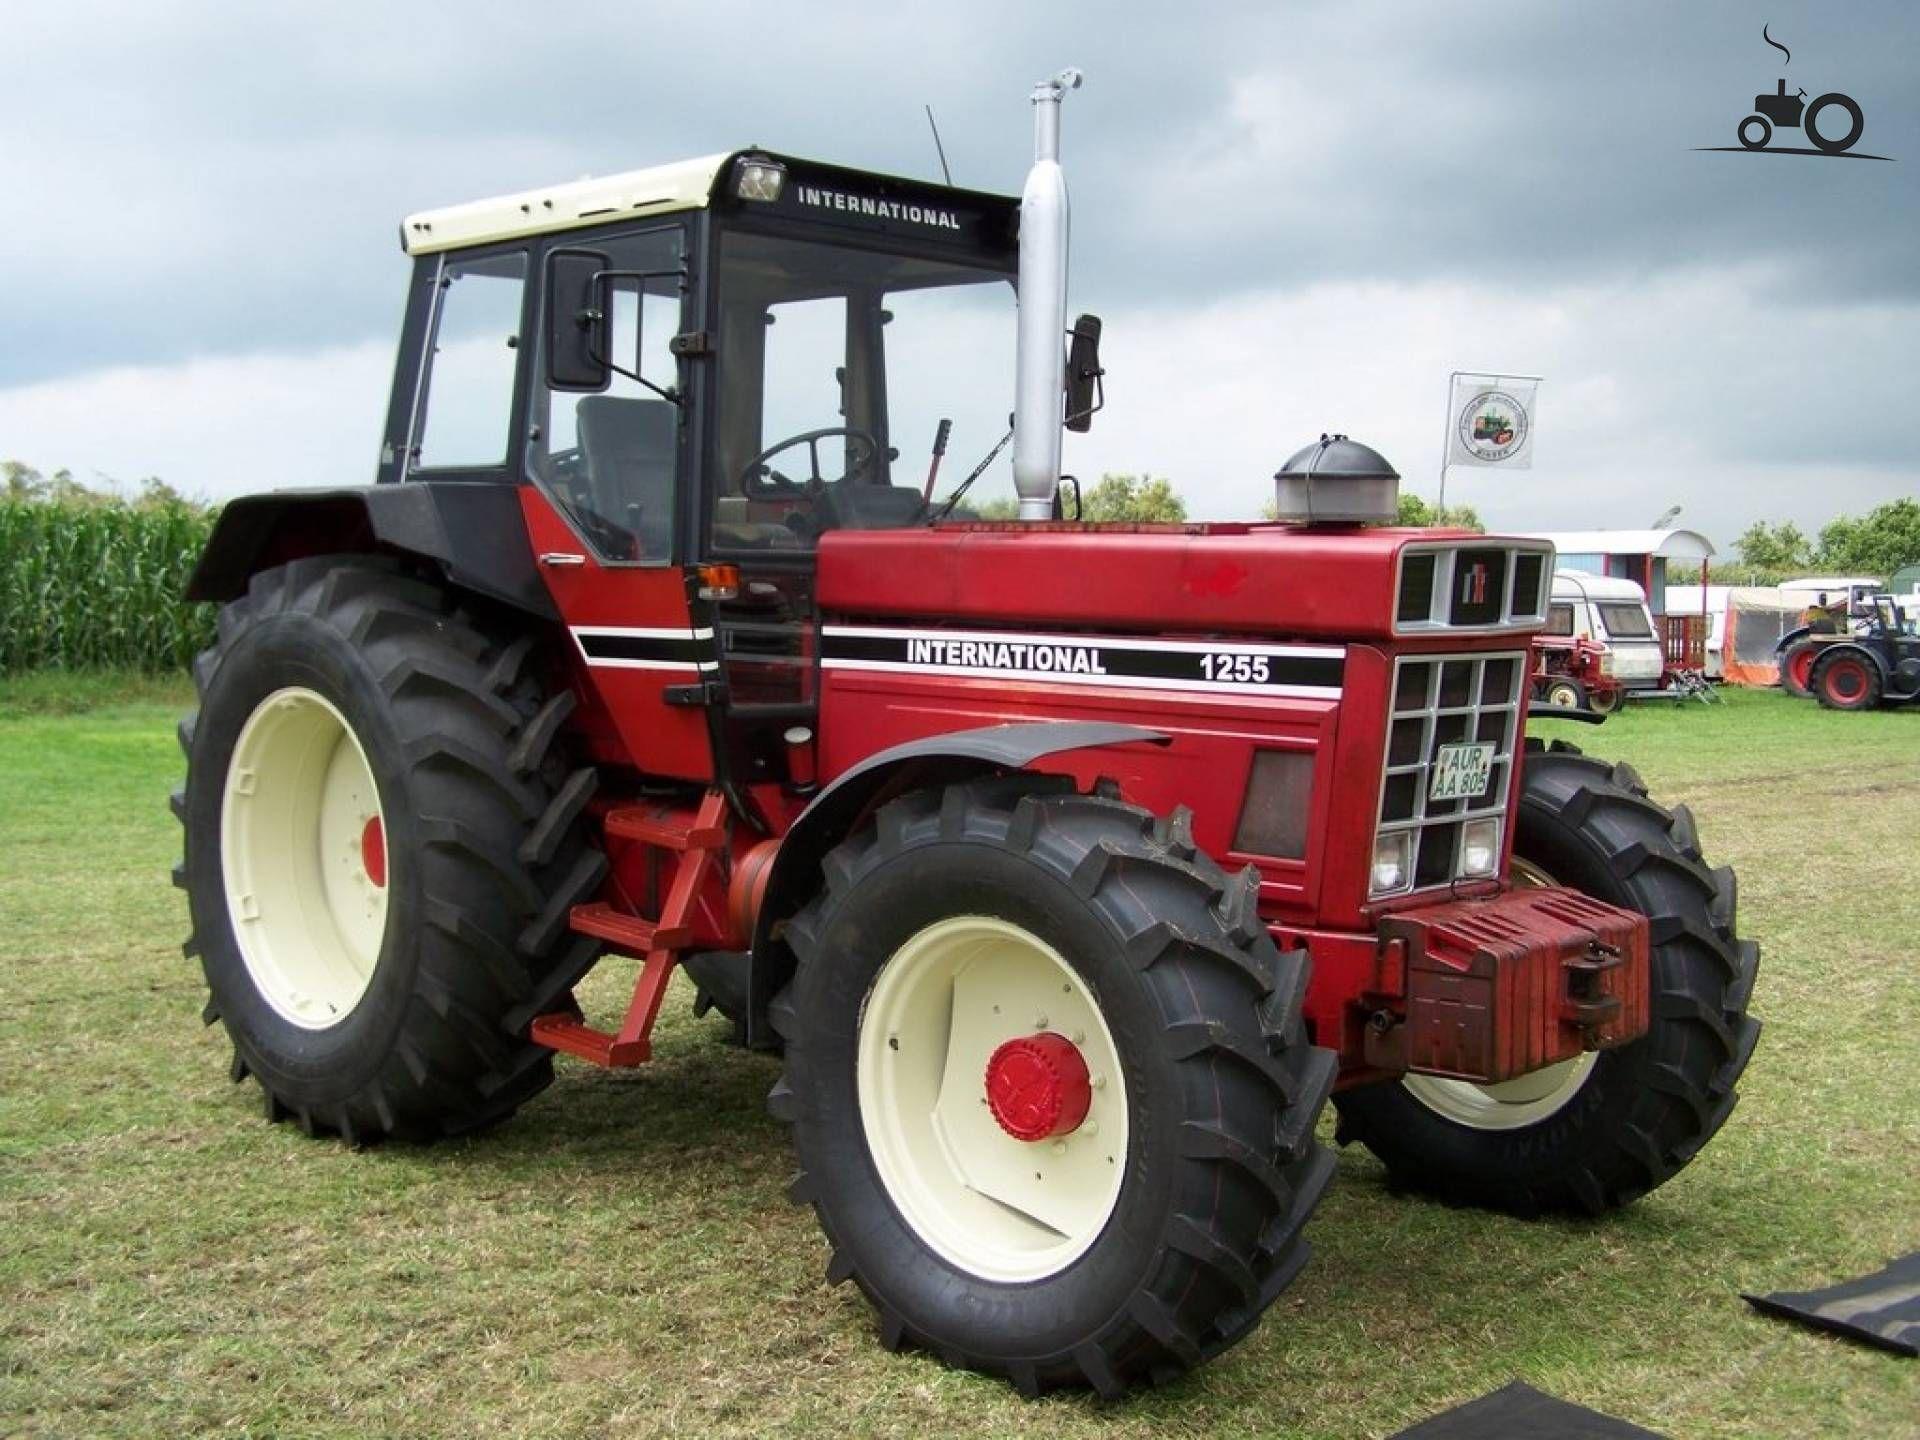 IH 1255 International Tractor | International 1255 foto's - Pagina 8